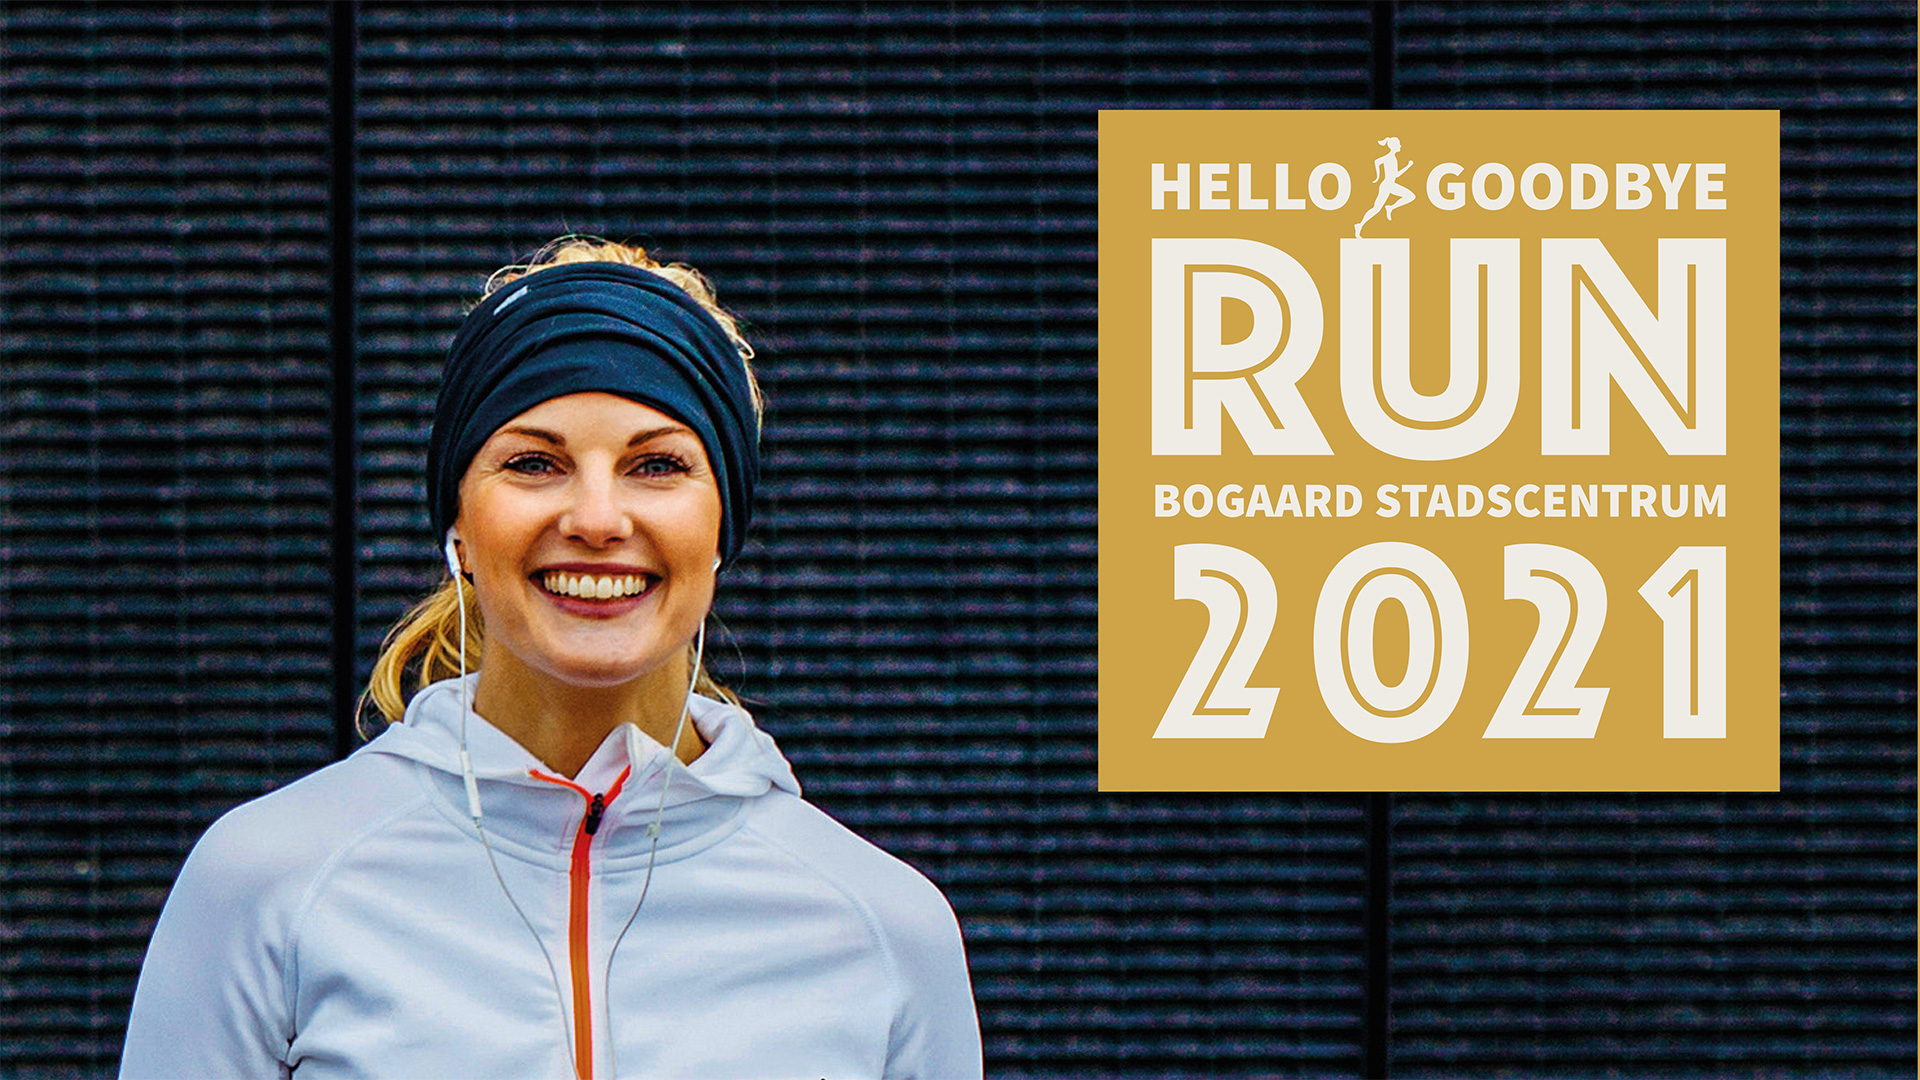 Hello Goodbye Run - Bogaard stadscentrum